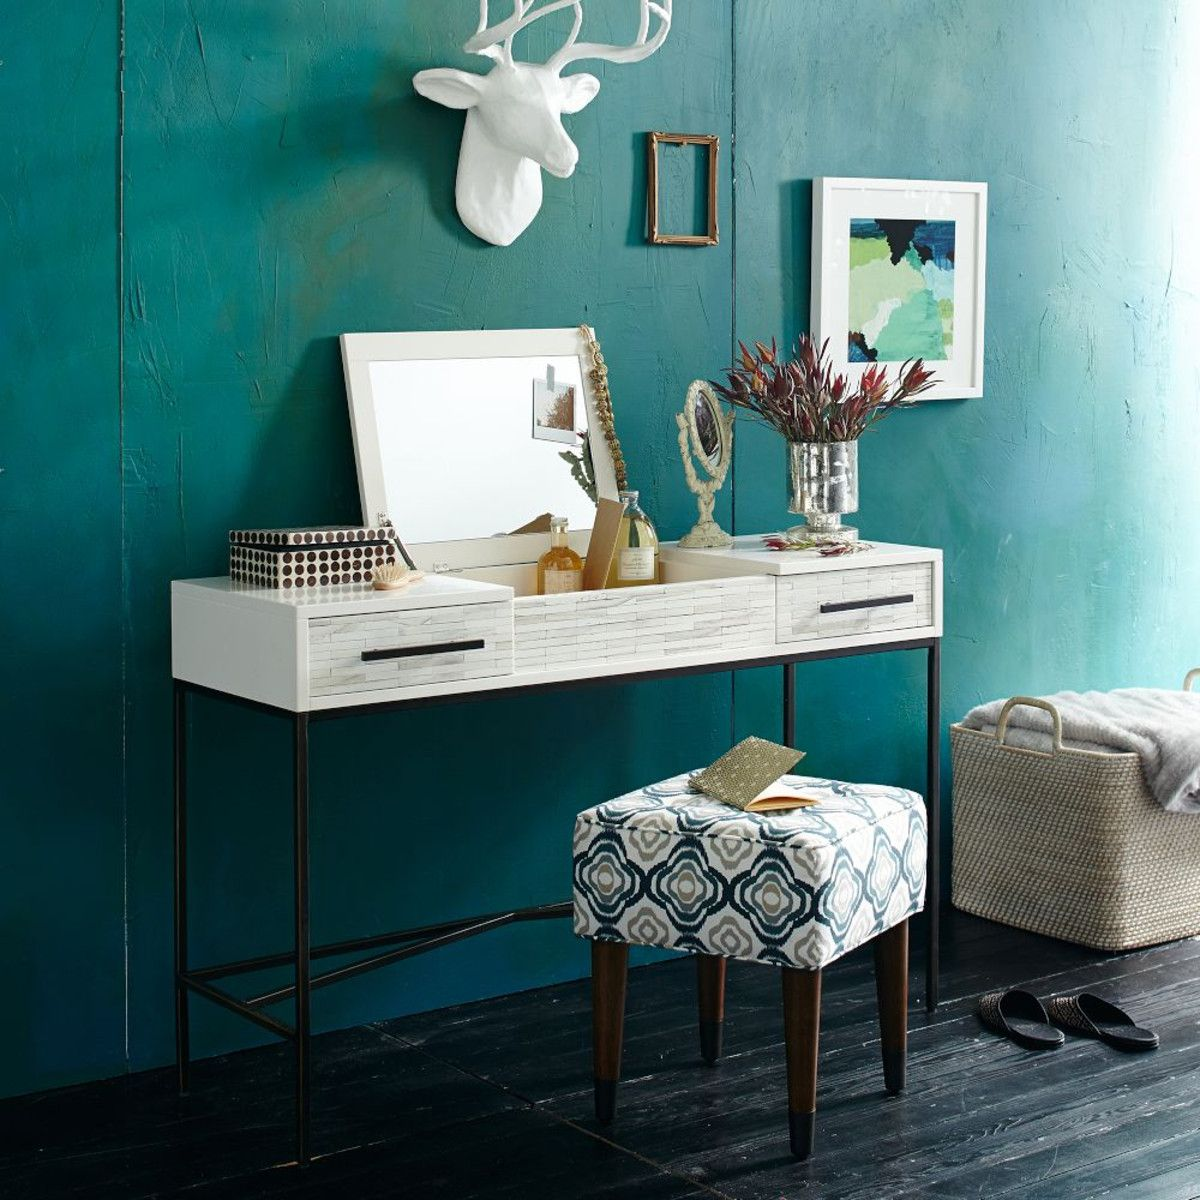 West elm bathroom cabinet - Wood Tiled Vanity West Elm Love If We Take The Smaller Bedroom For Makeup